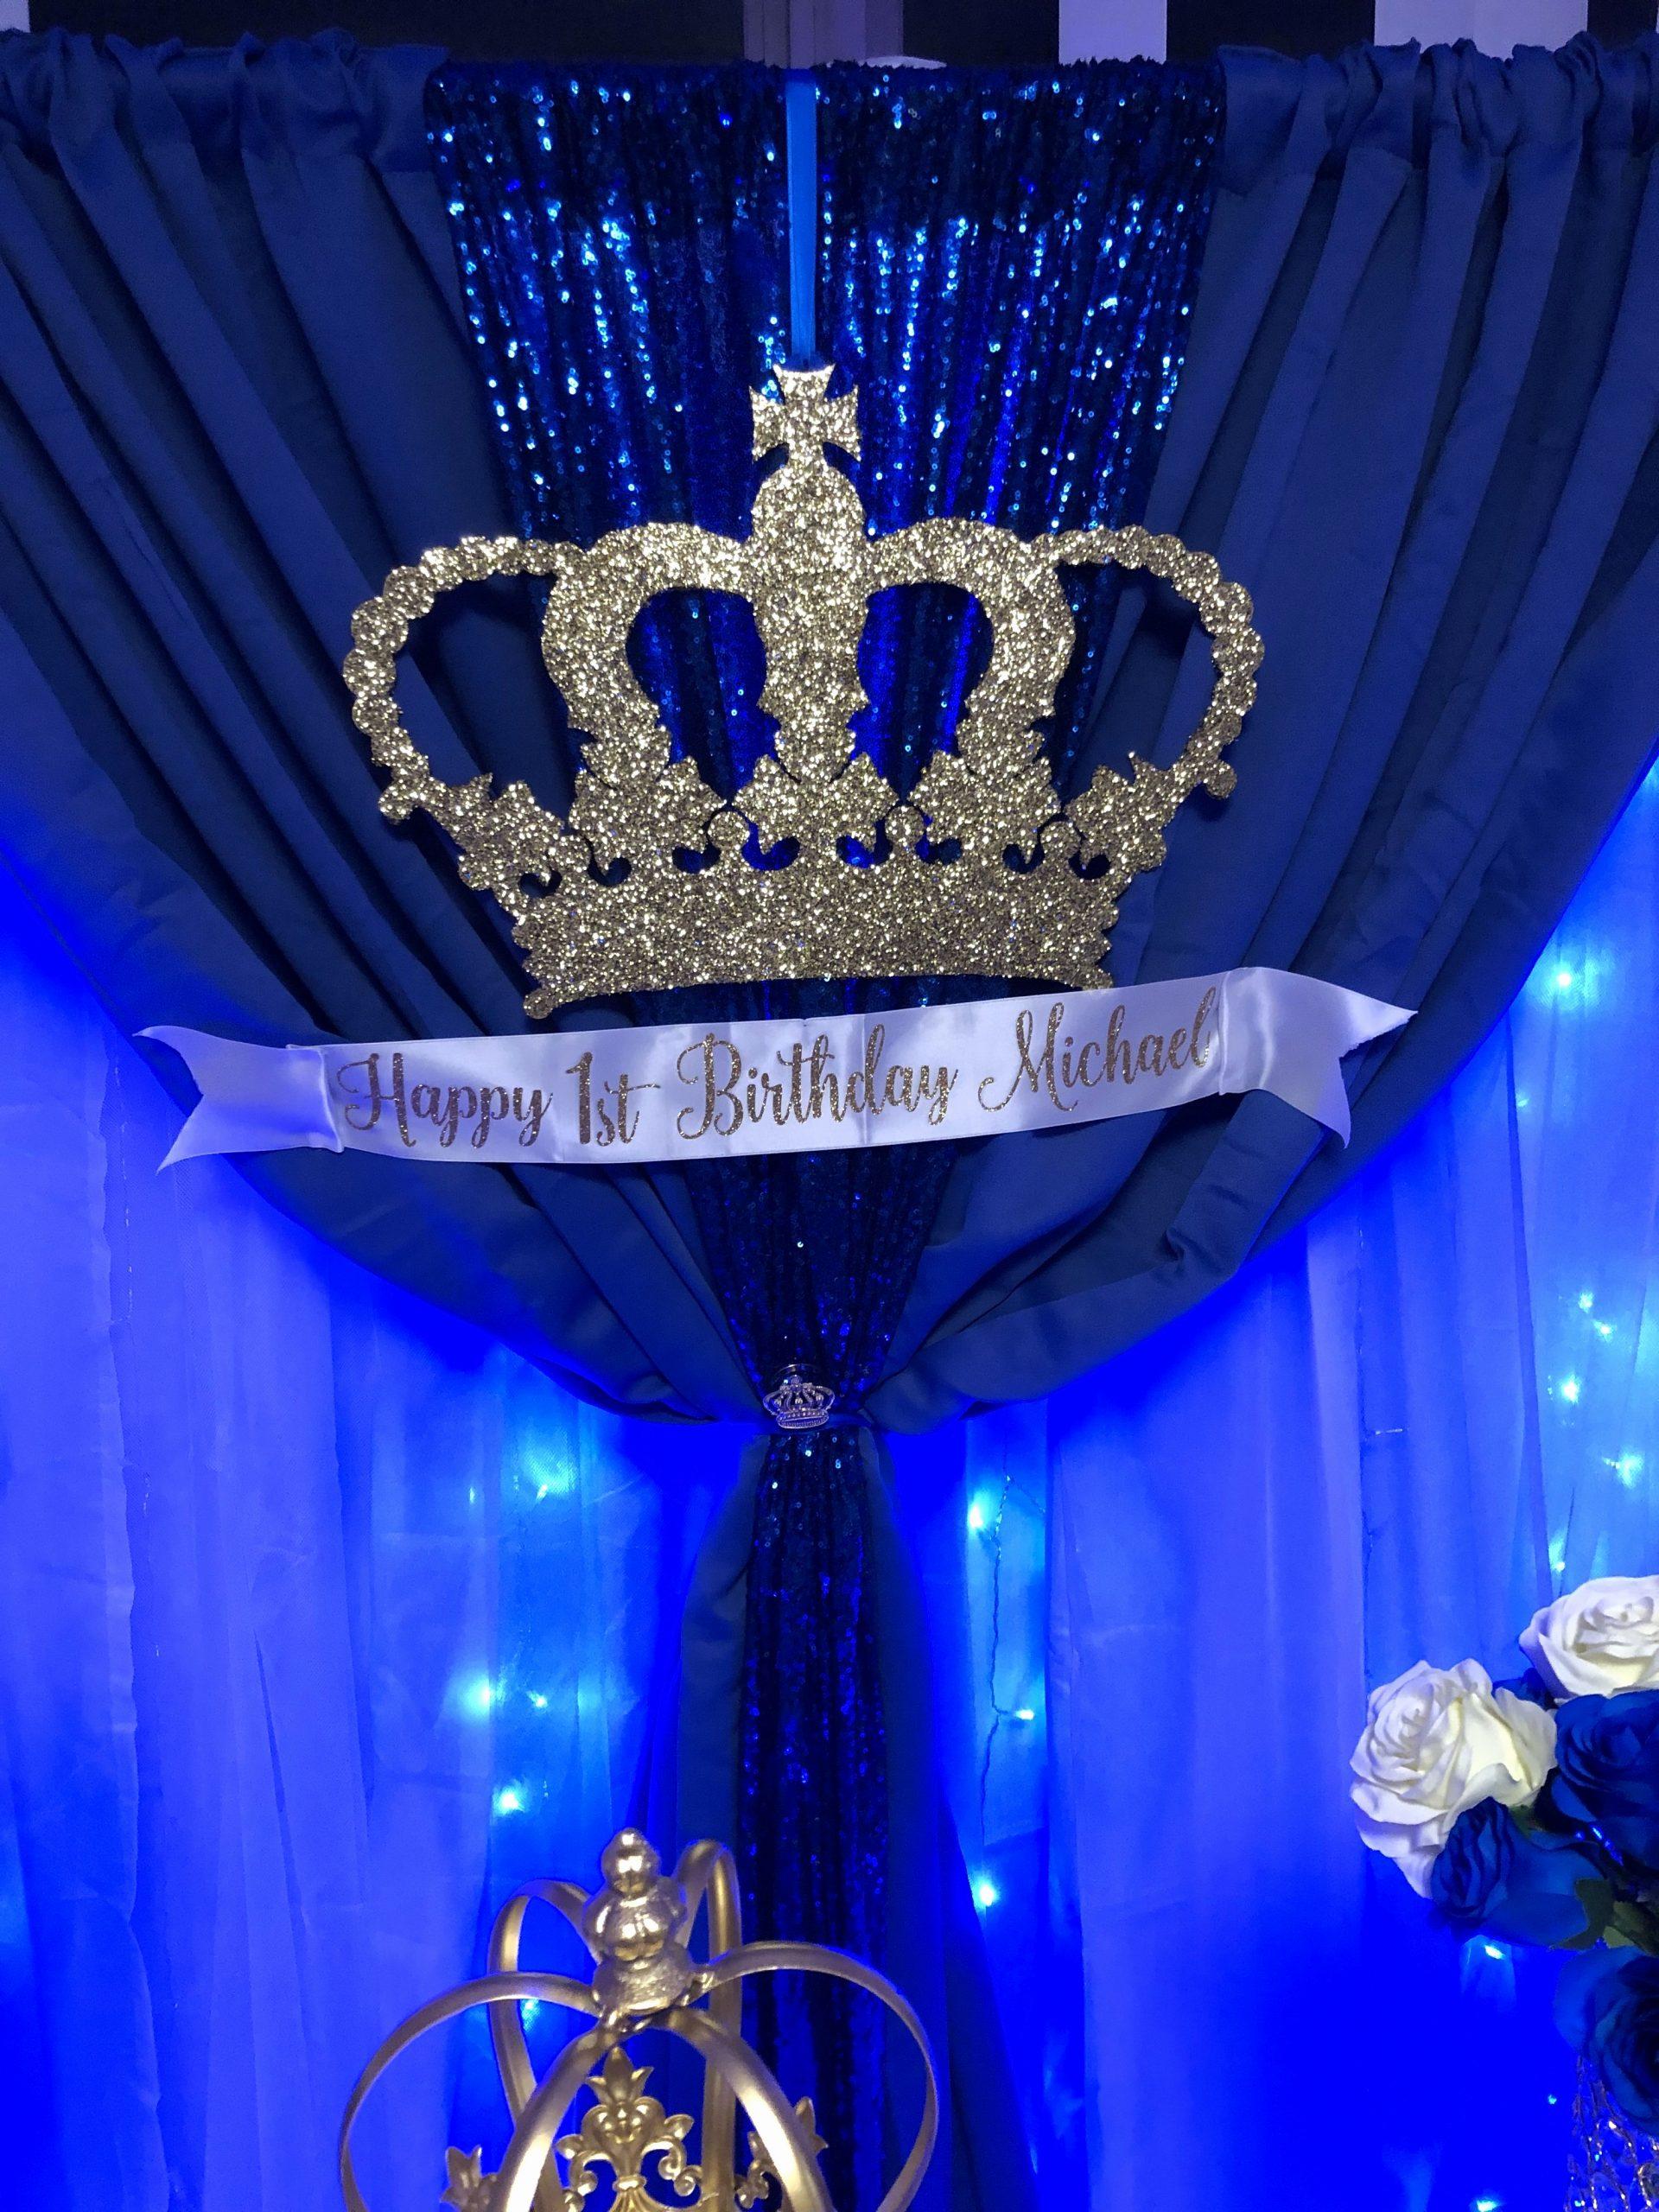 Prince Birthday Decoration Ideas Inspirational Prince Birthday Party Decorations Prince Background